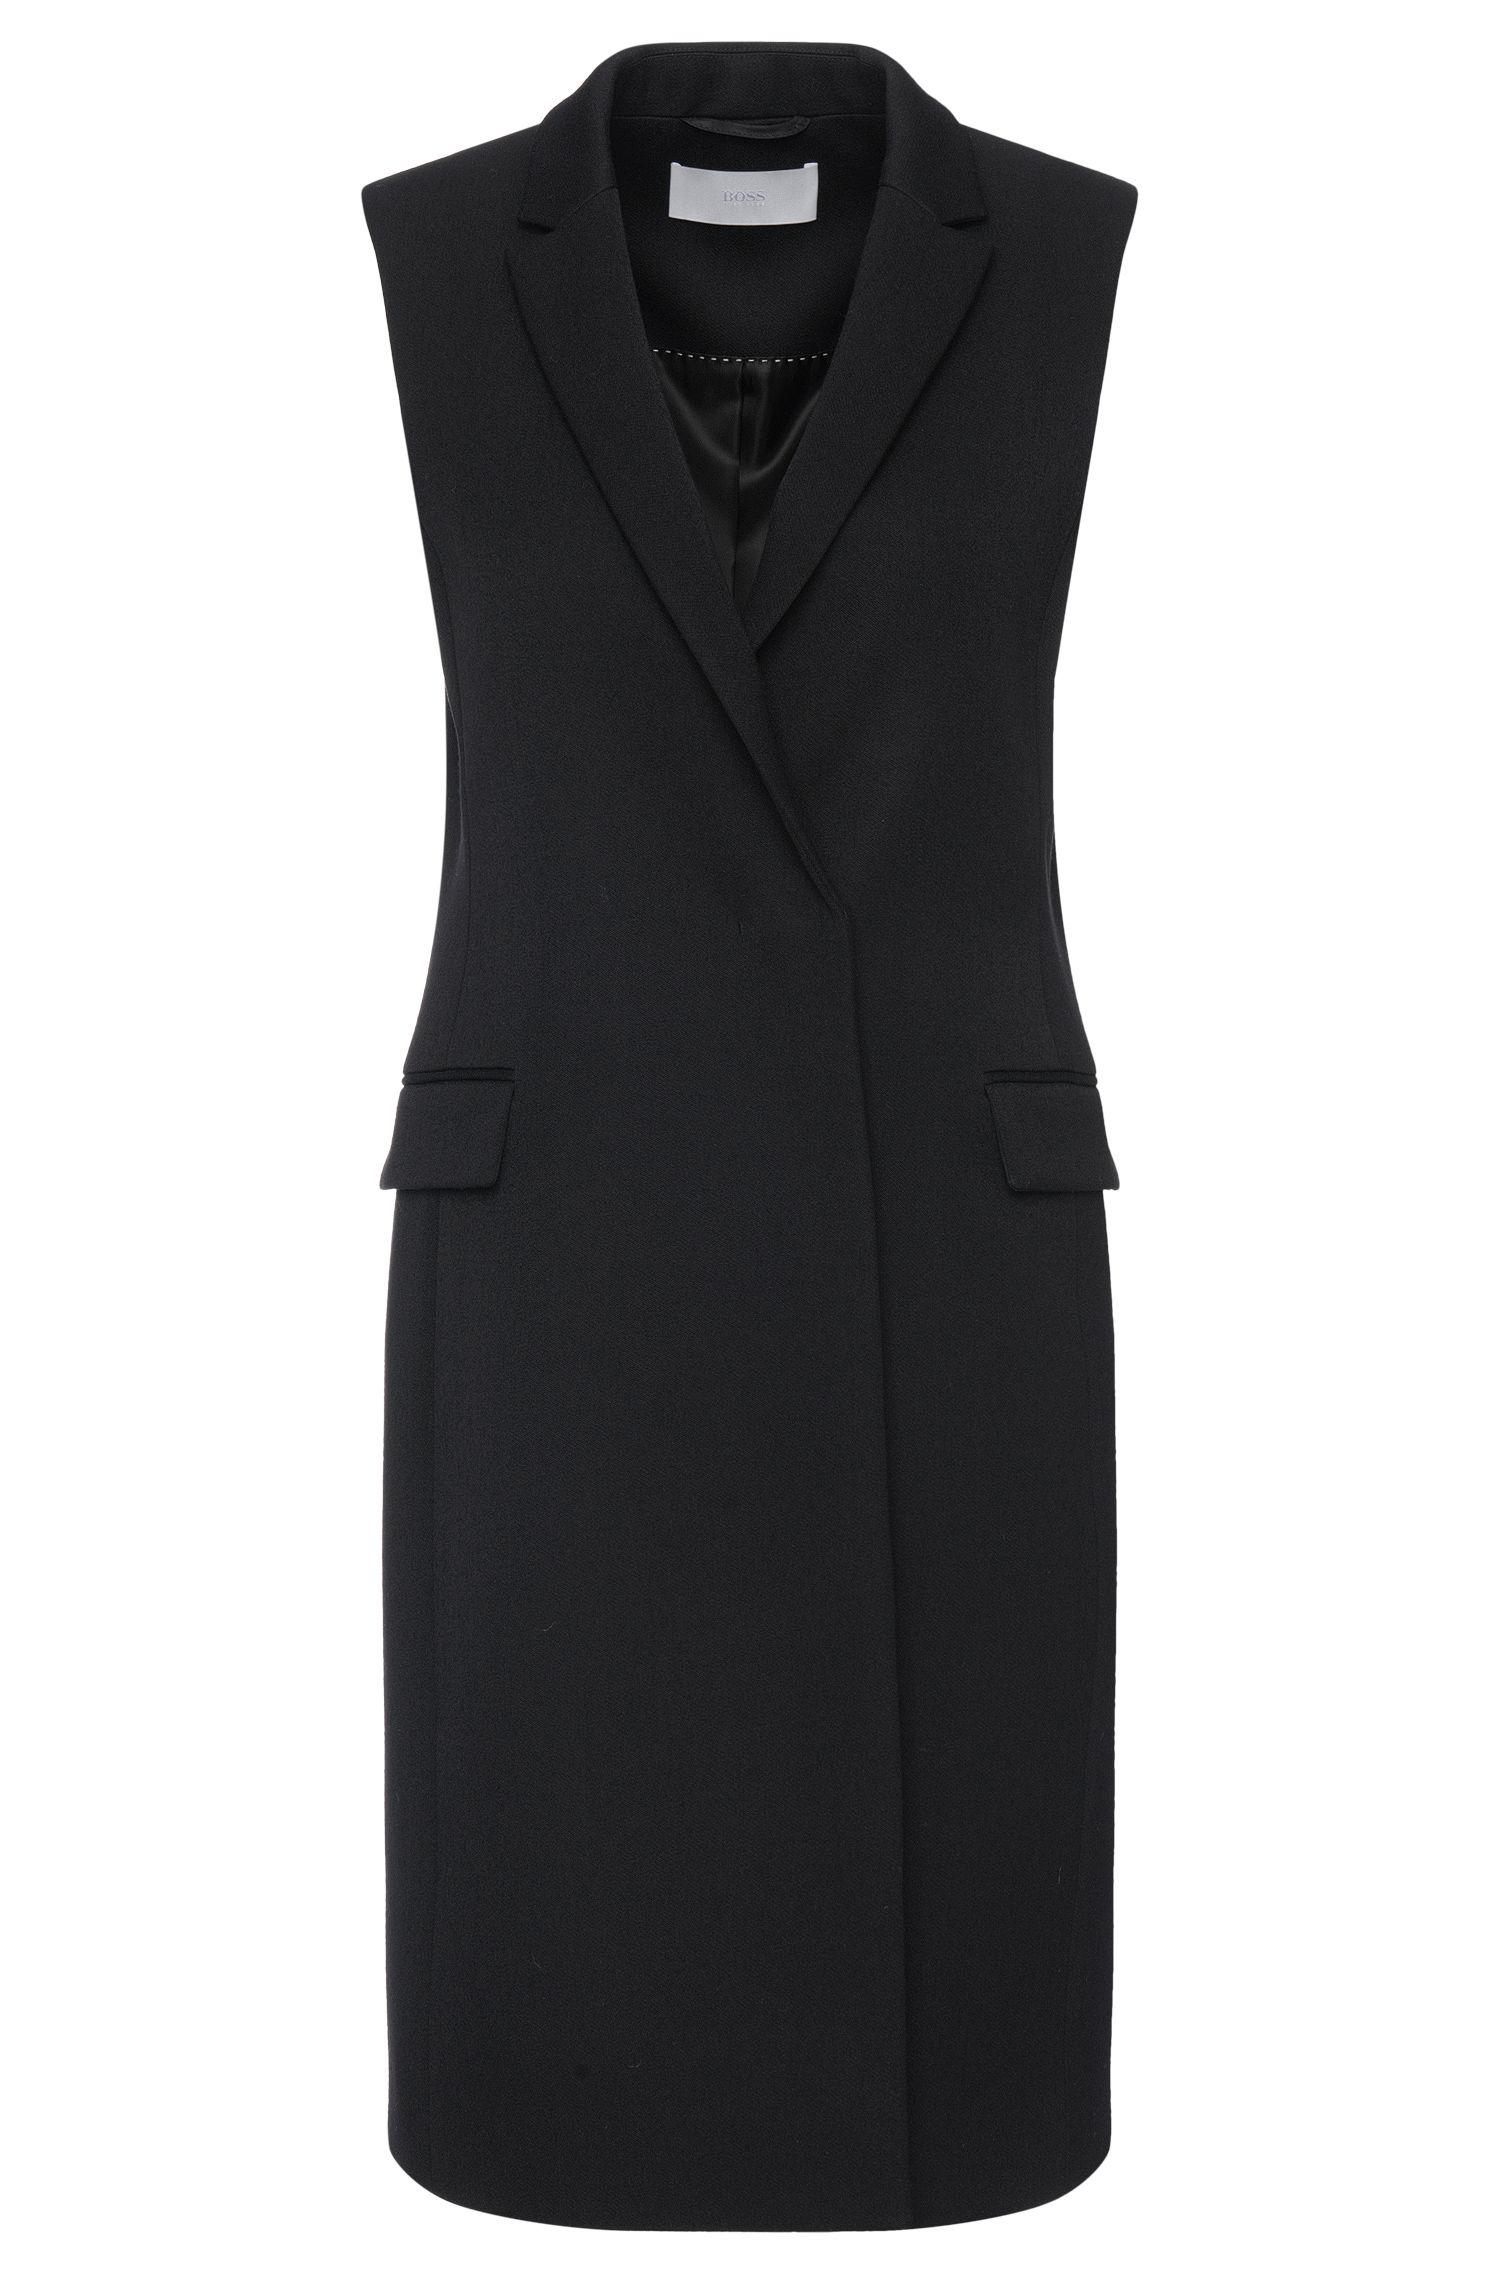 'Karana' | Wool Blend Vest